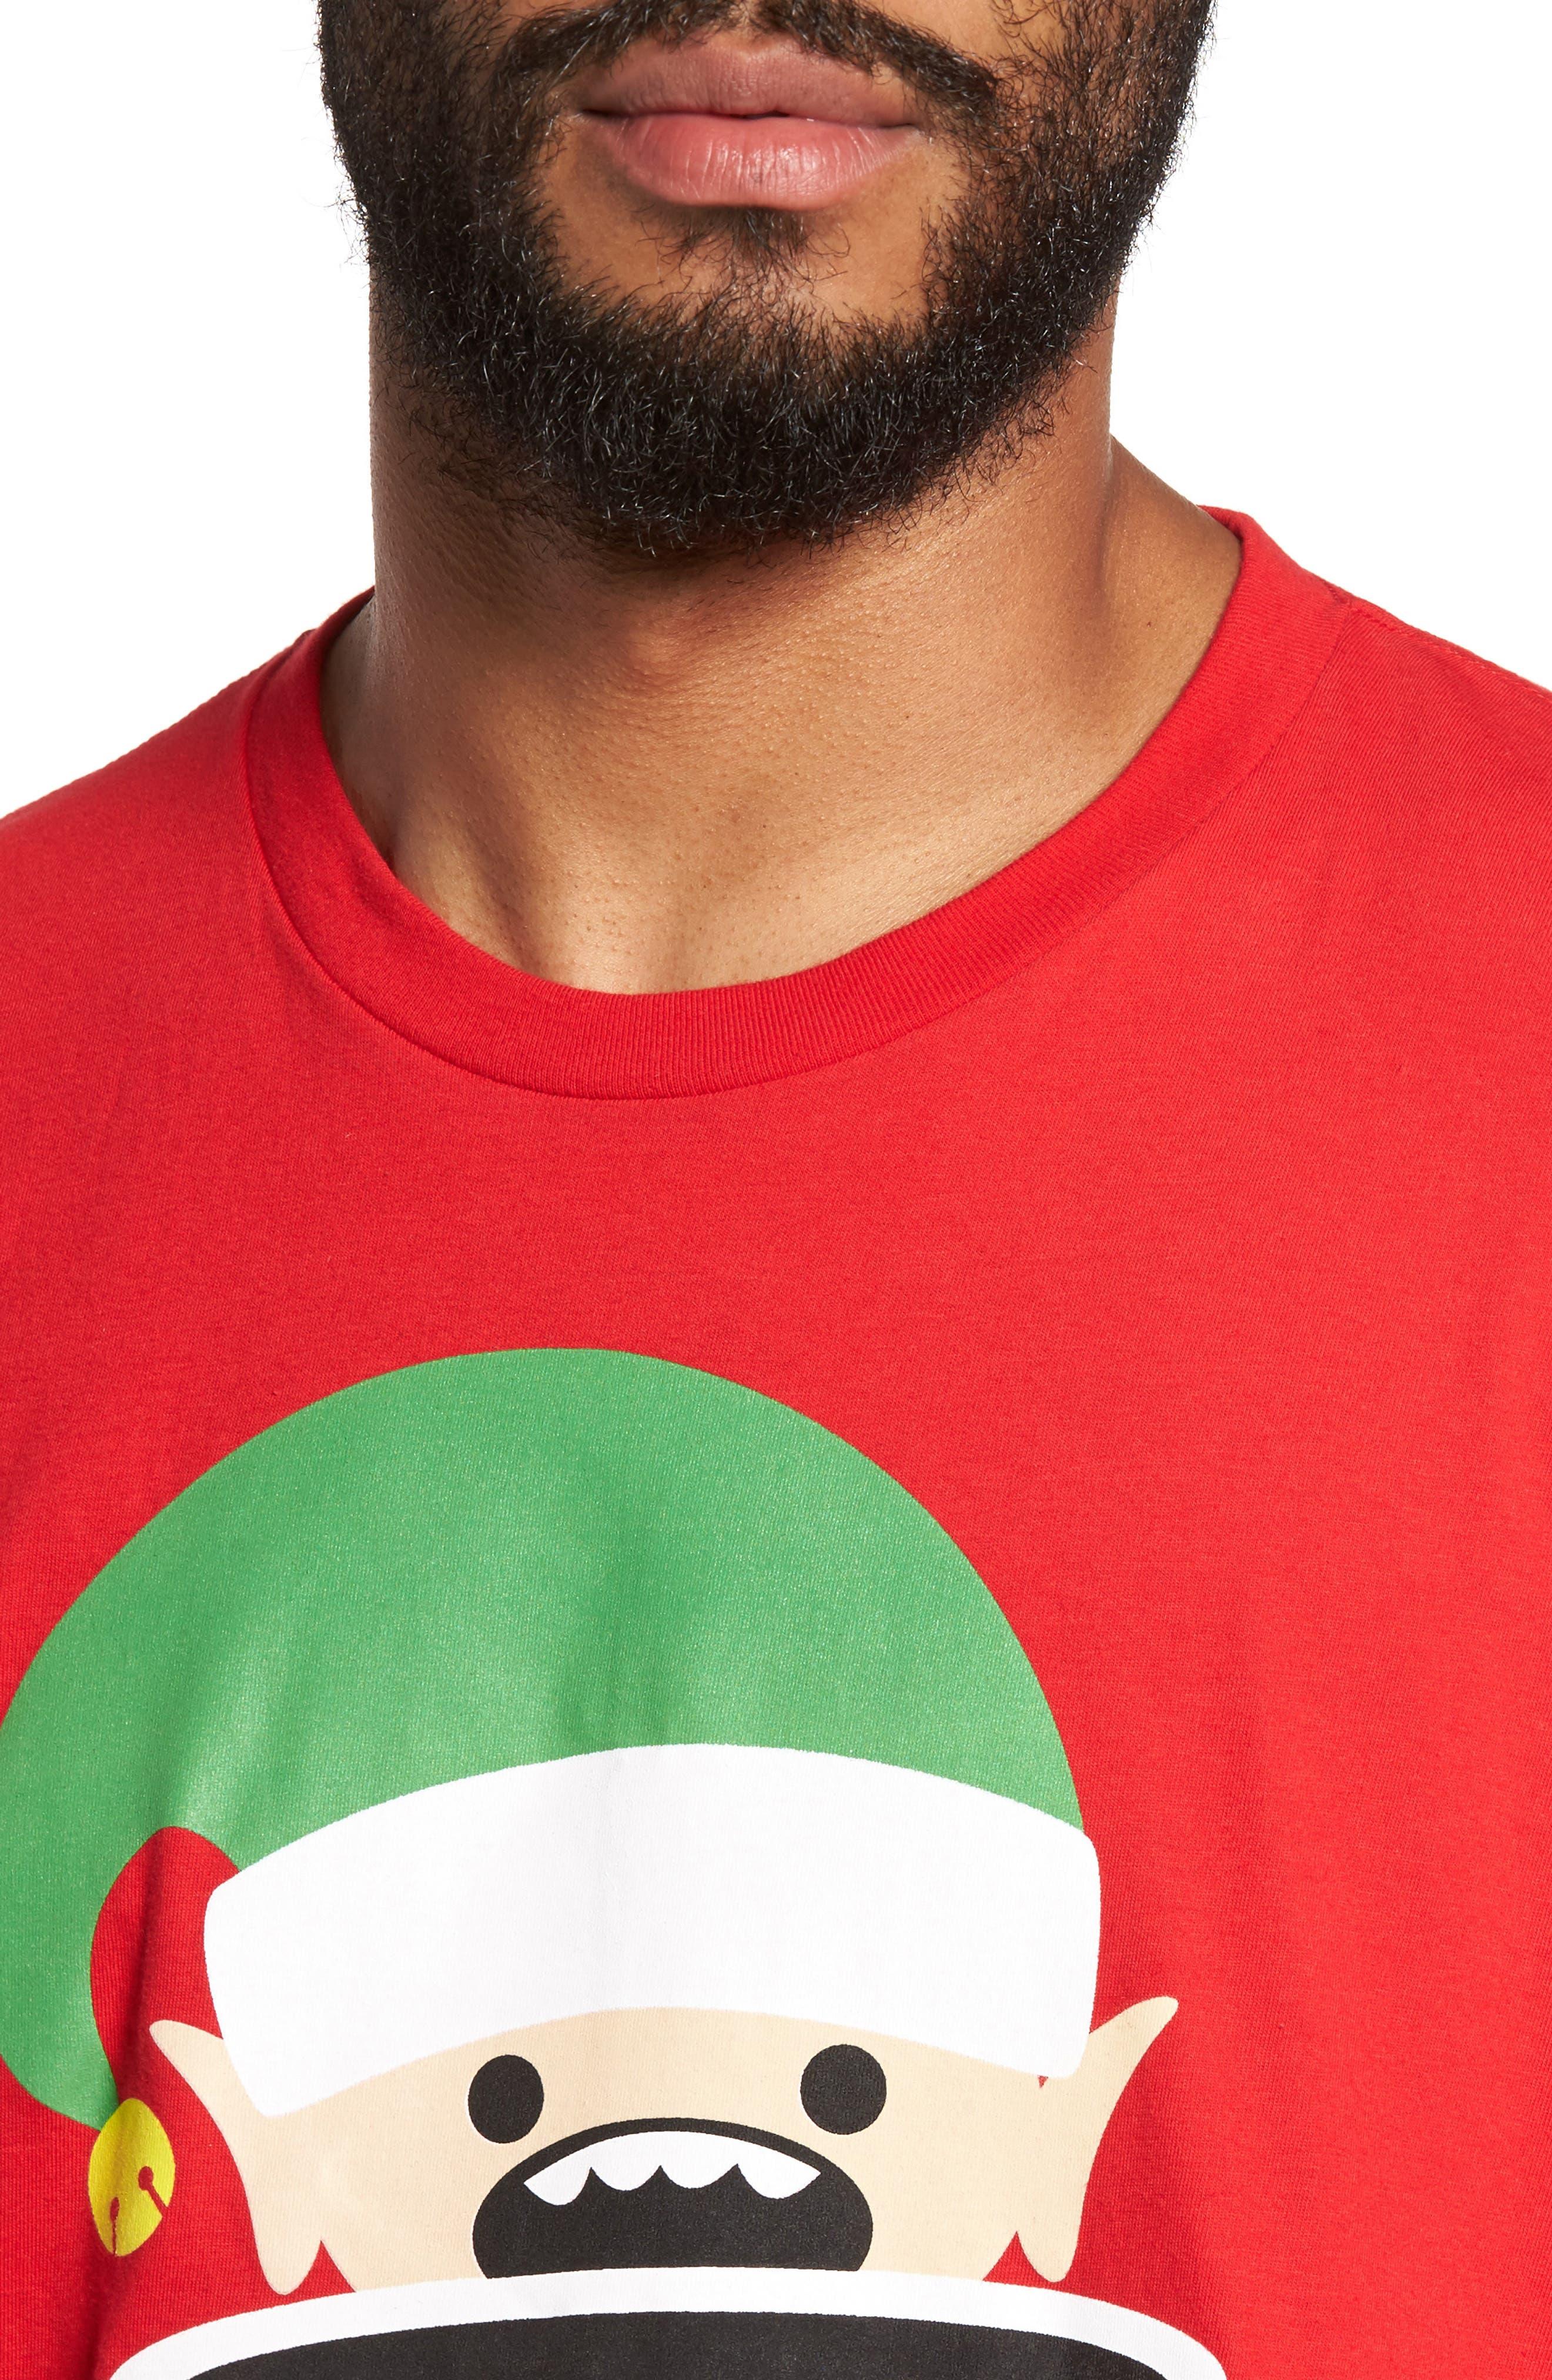 Stay Woke T-Shirt,                             Alternate thumbnail 4, color,                             Red Stay Woke